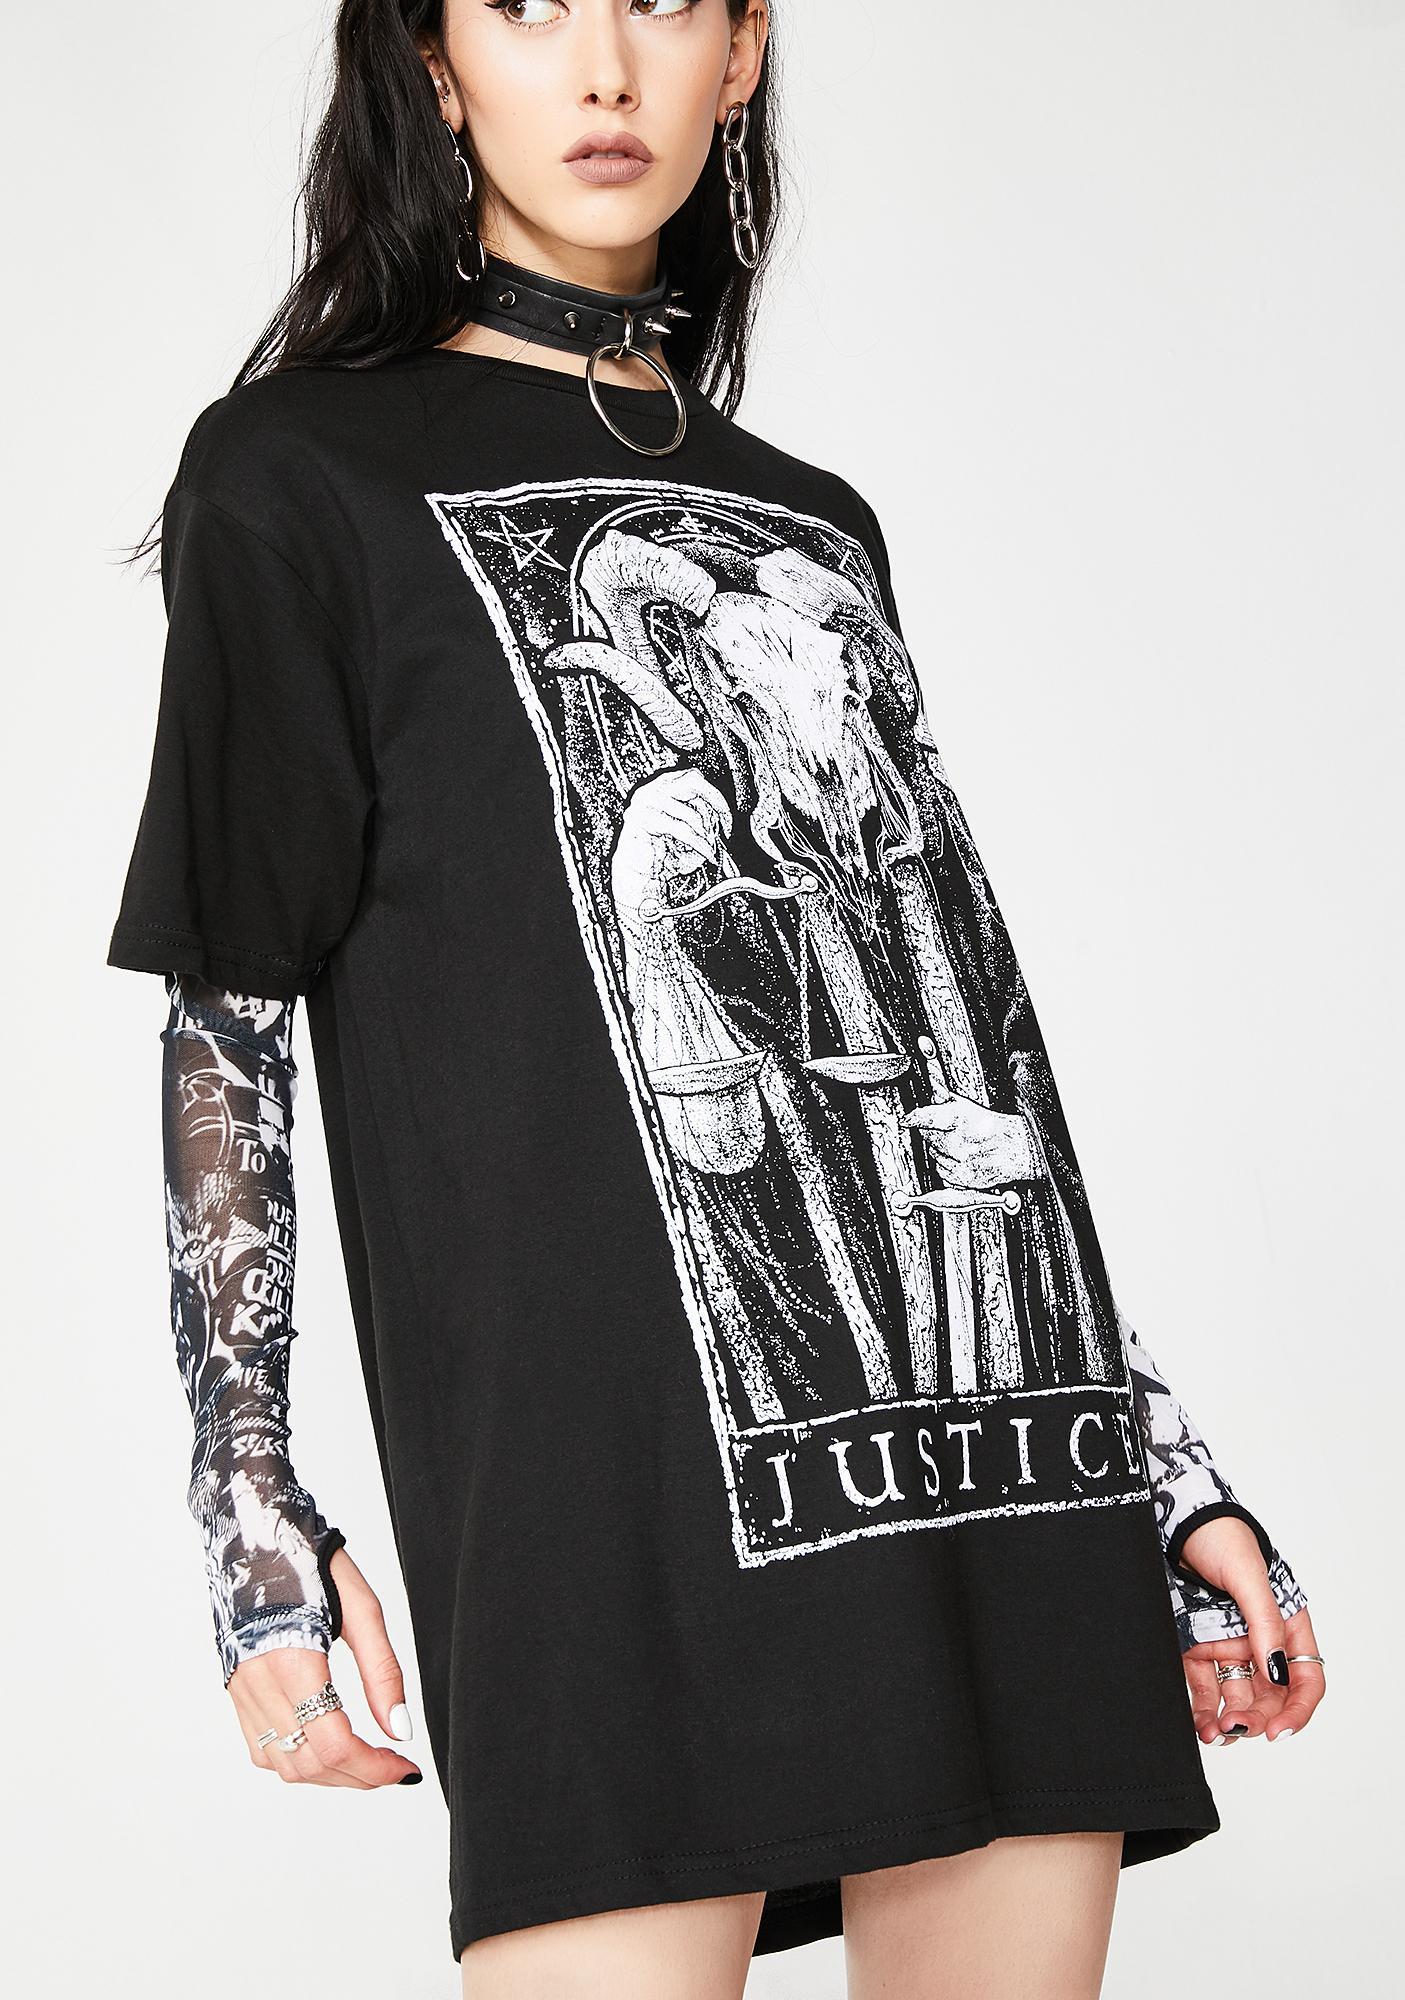 Mortus Viventi Justice T-Shirt